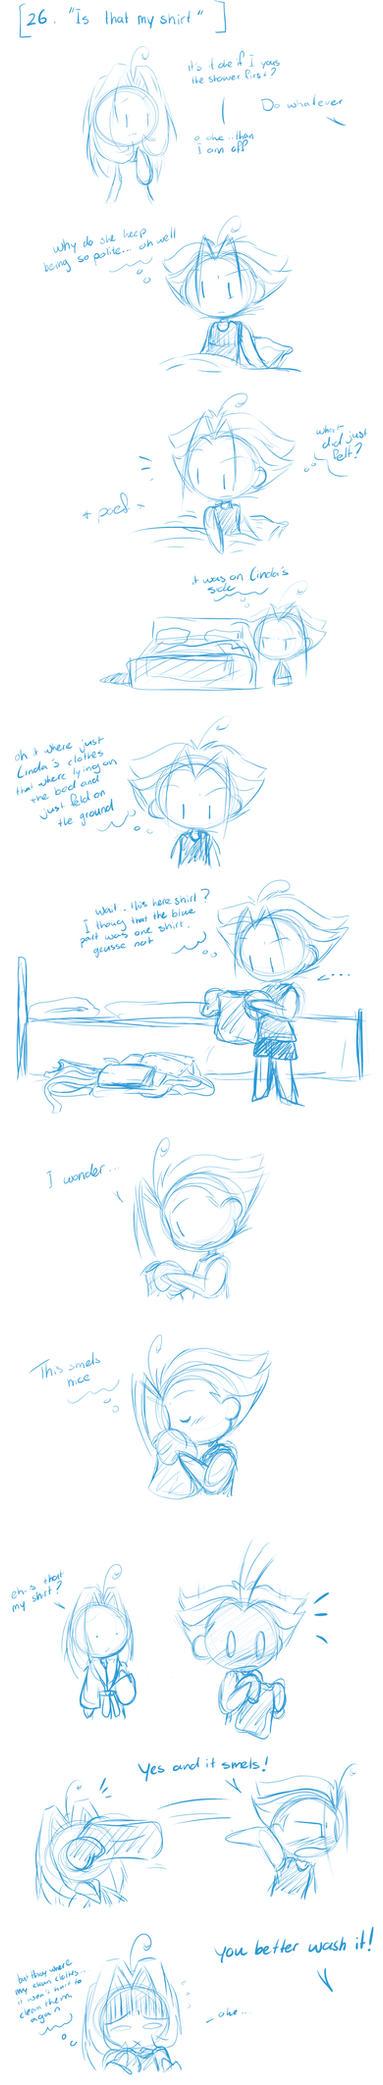 sketch dump question 26 by I-Am-Bleu